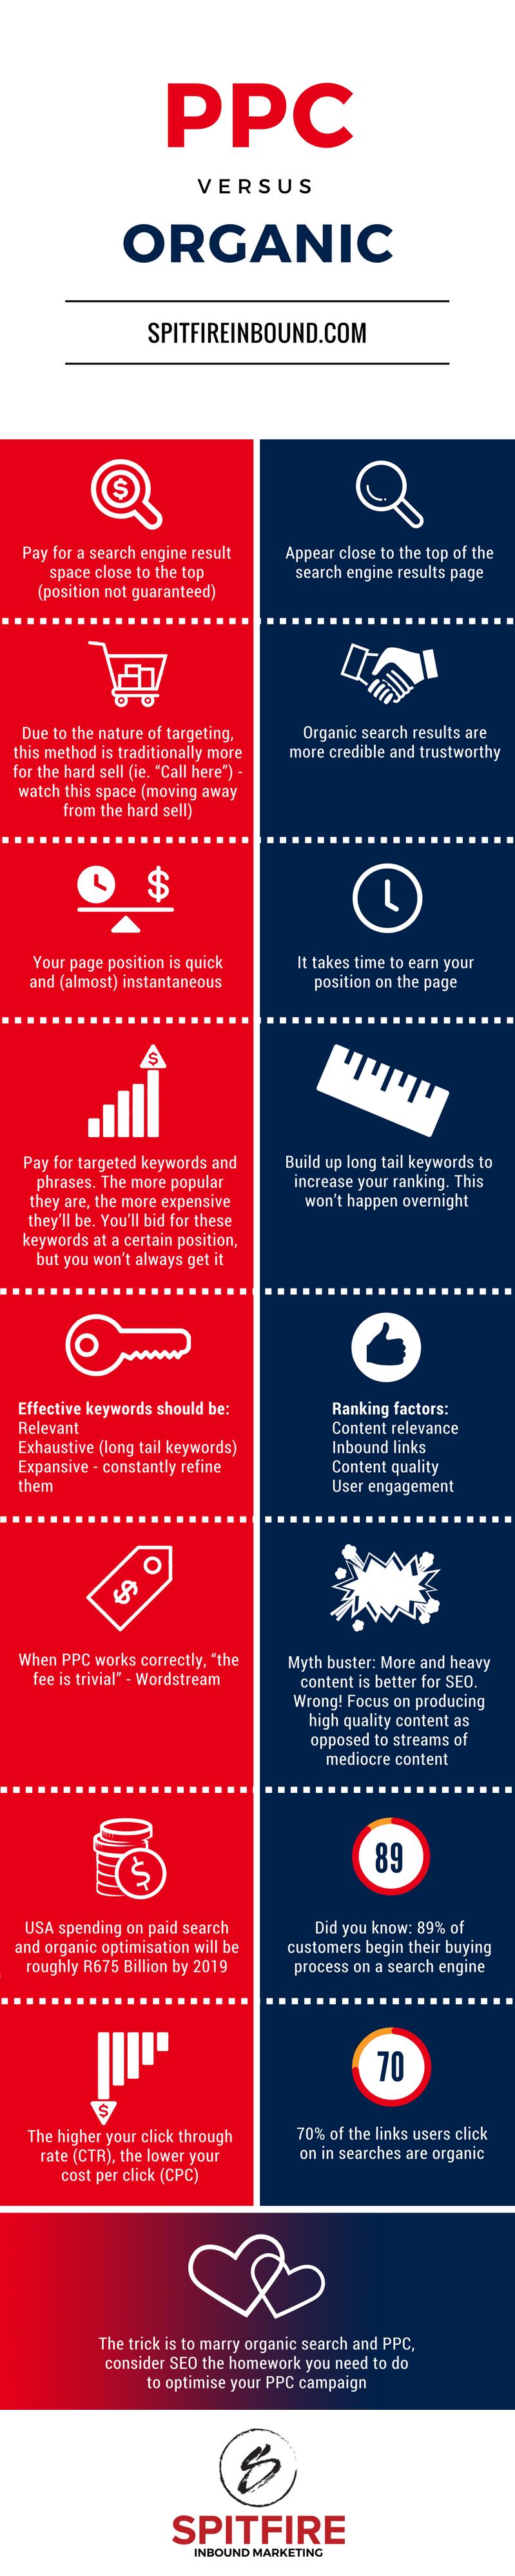 Spitfire Inbound Marketing   PPC vs. SEO Infographic